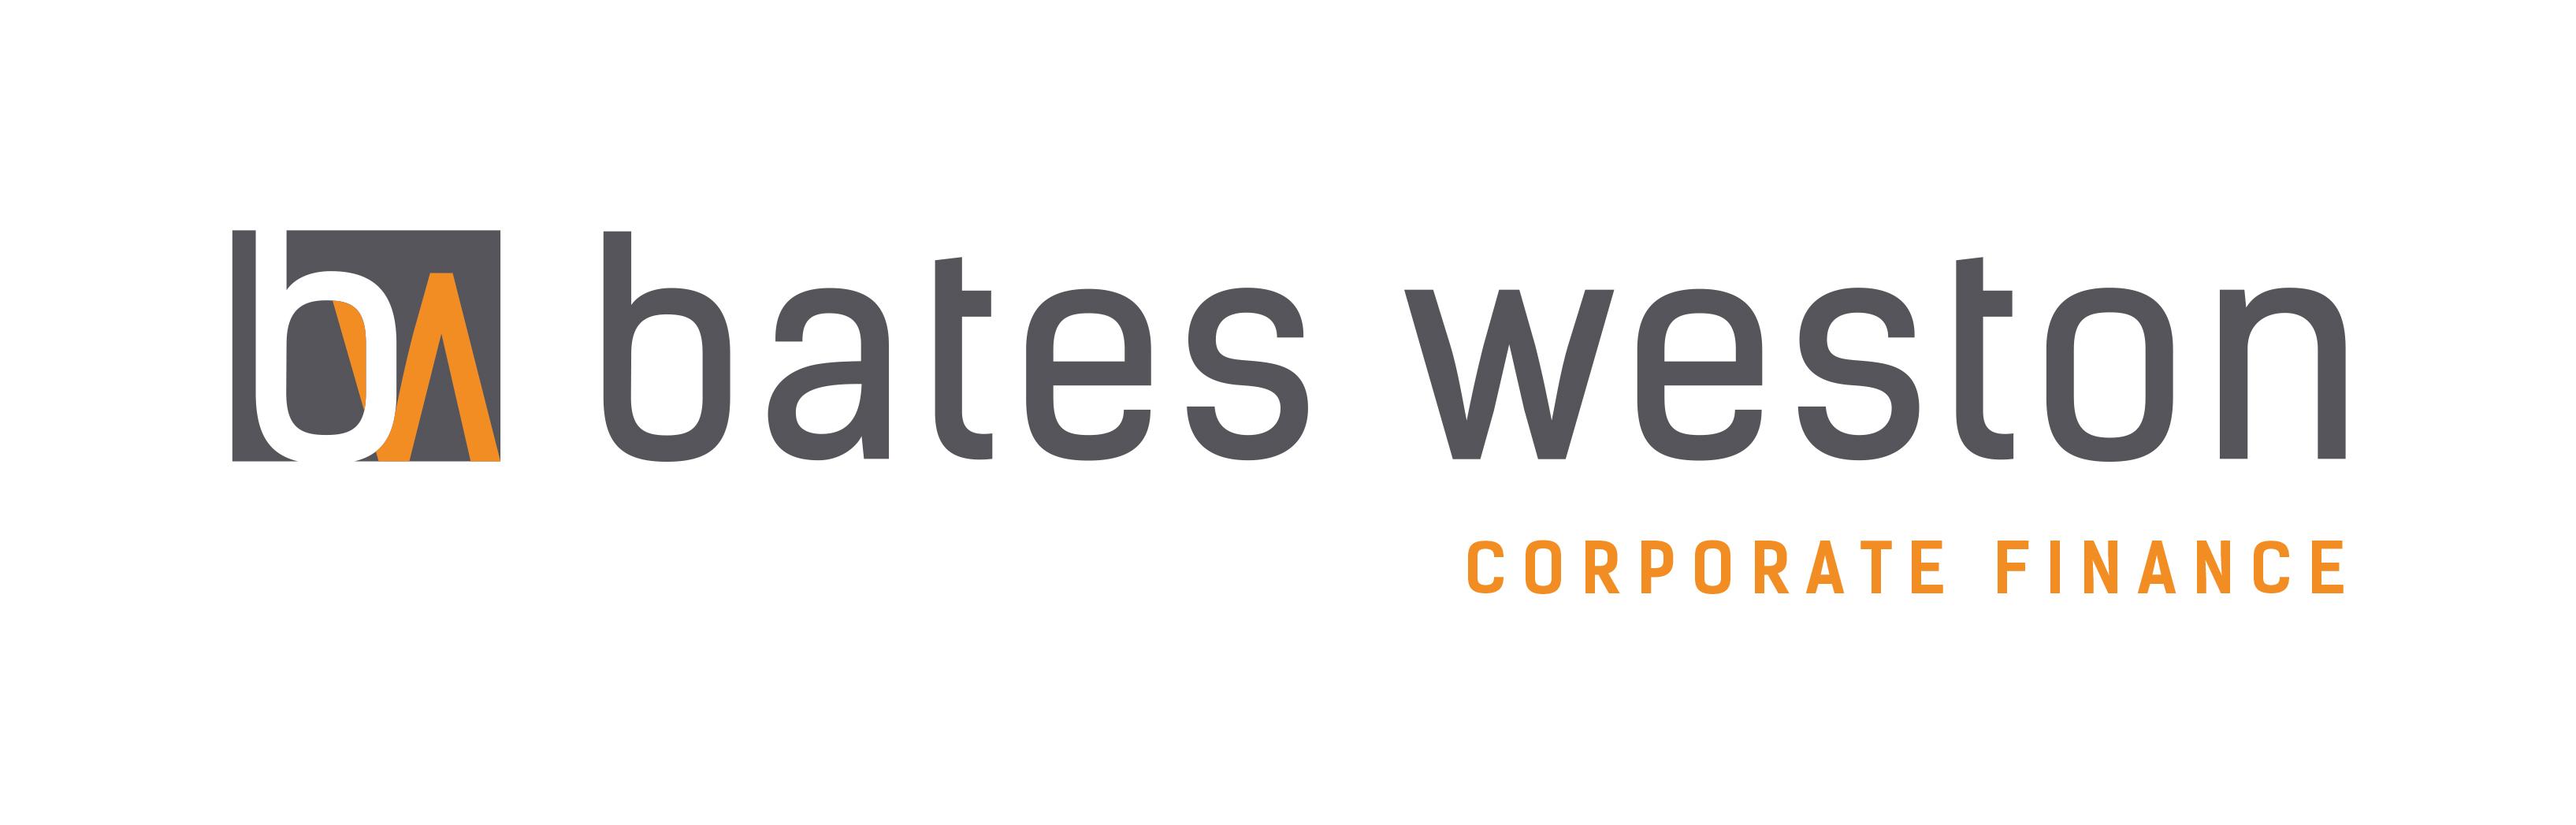 Bates Weston Corporate Finance logo